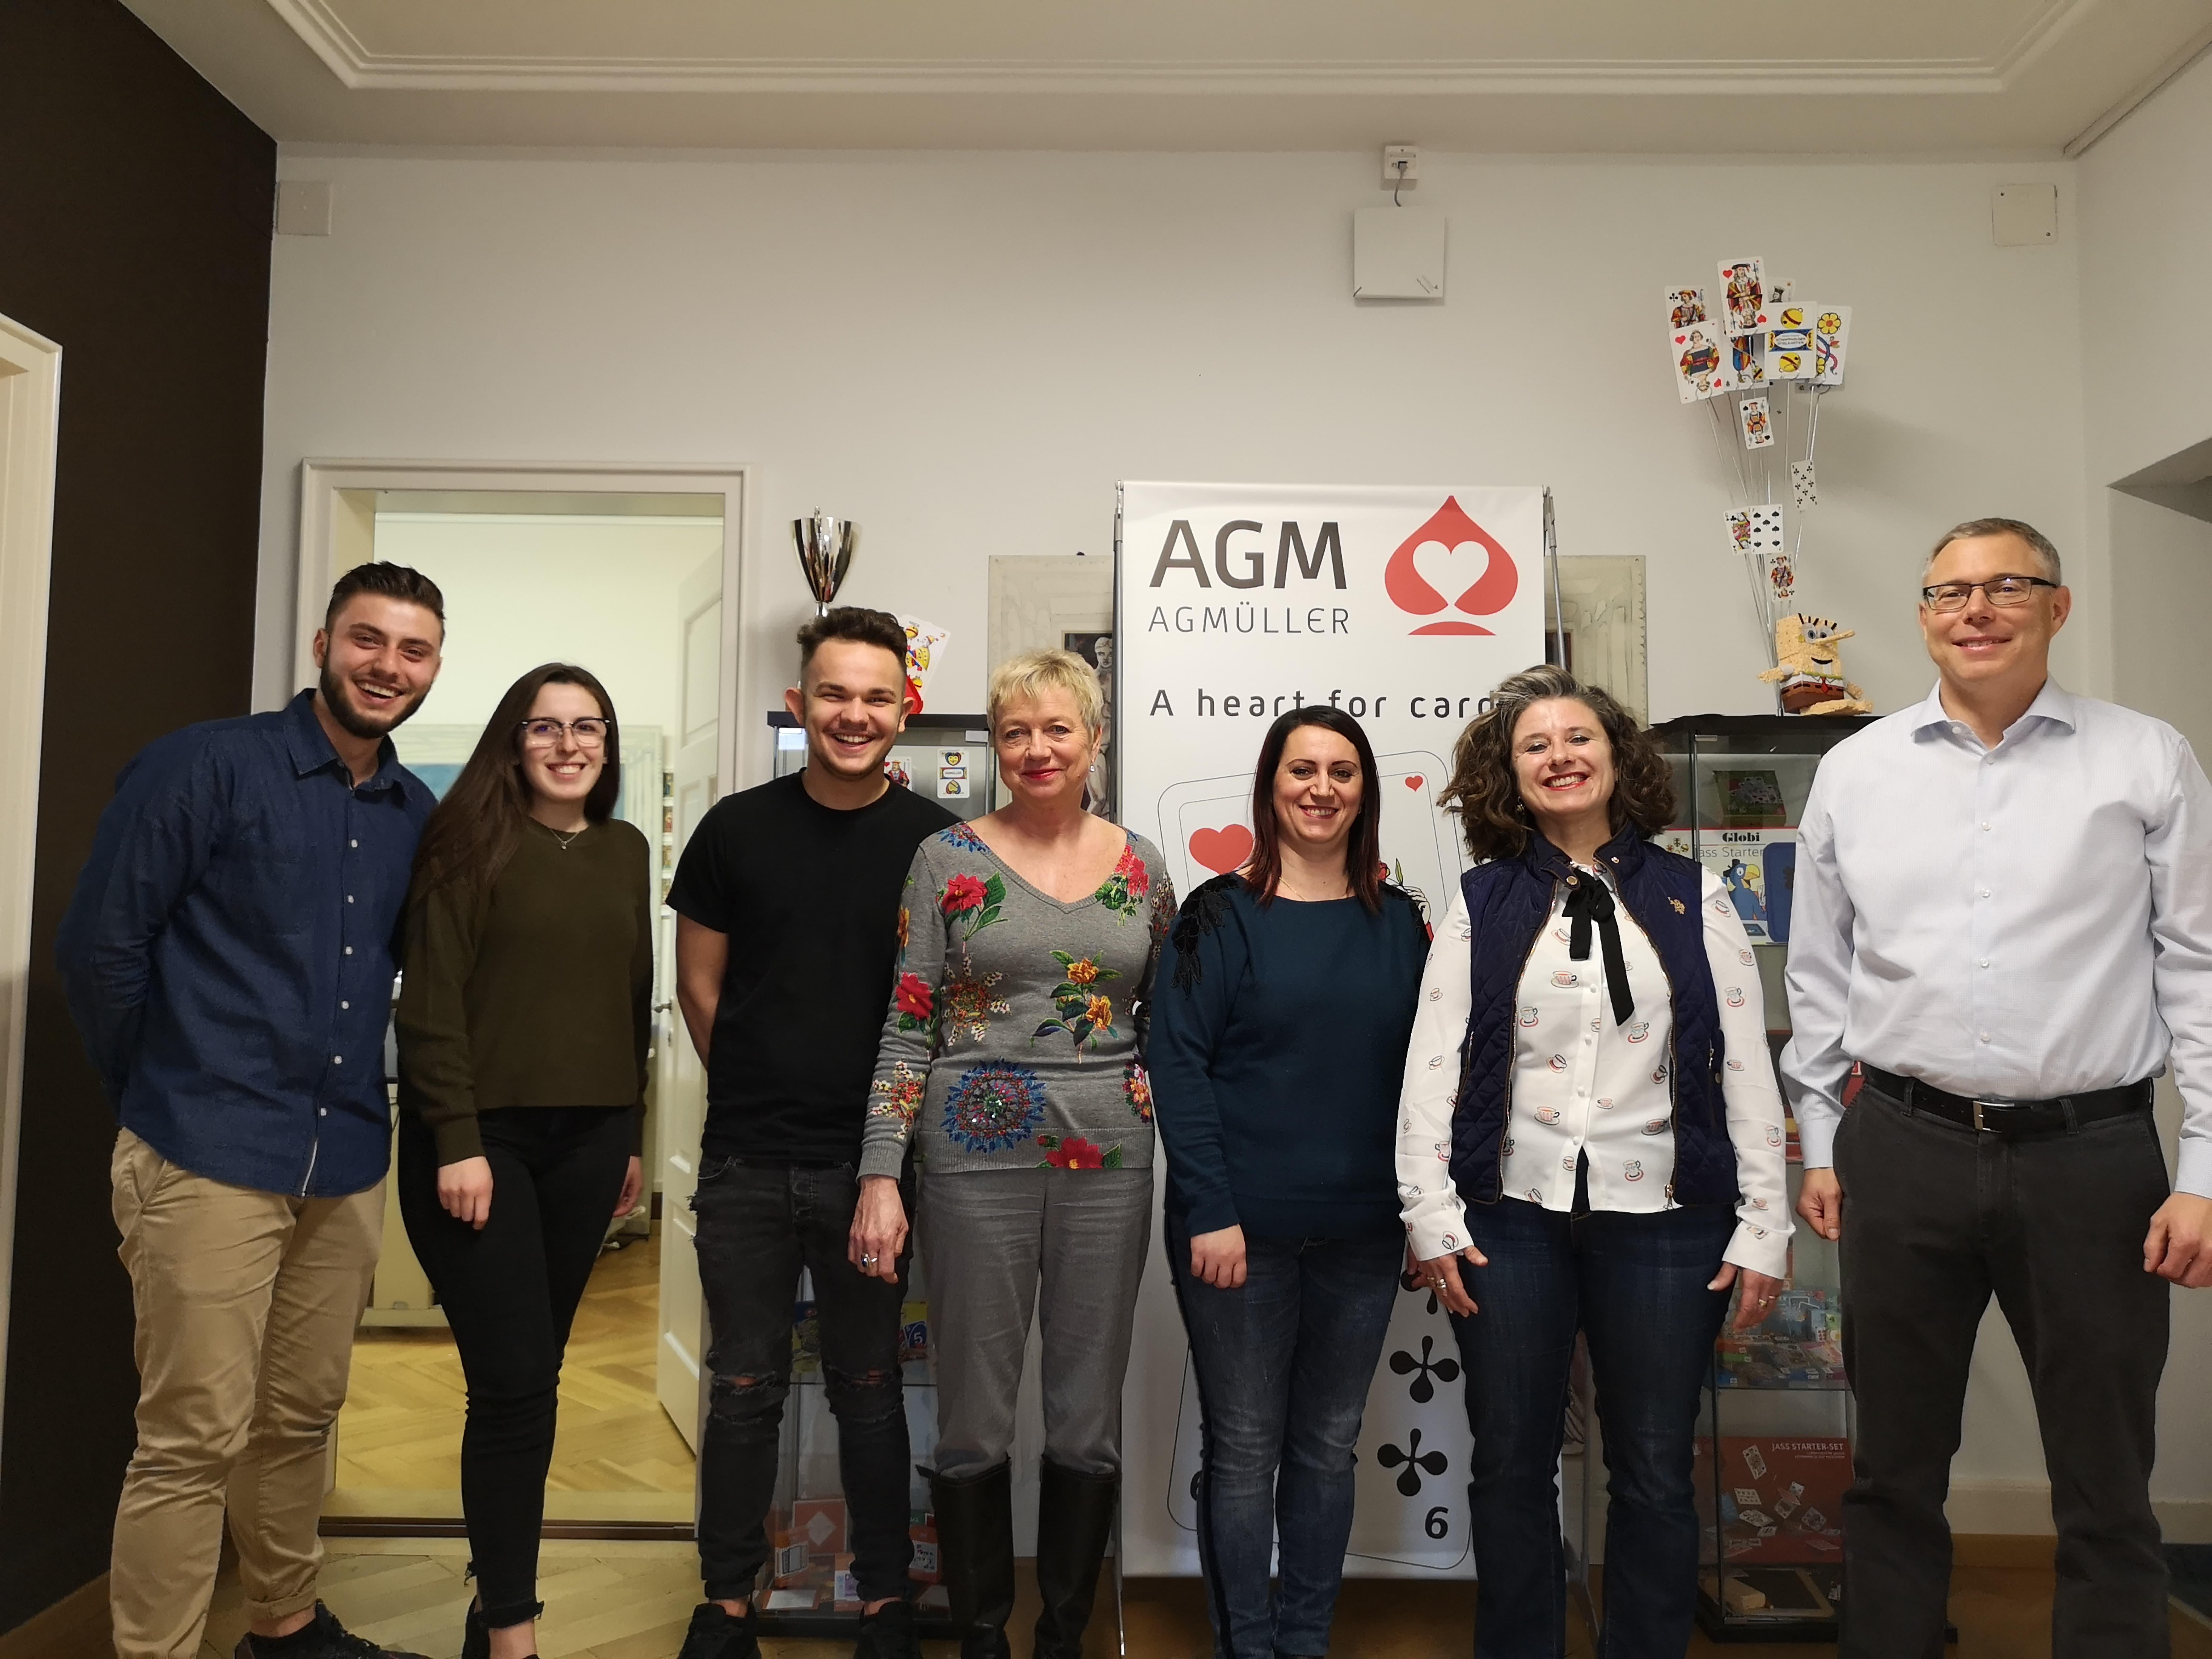 Team AGMüller